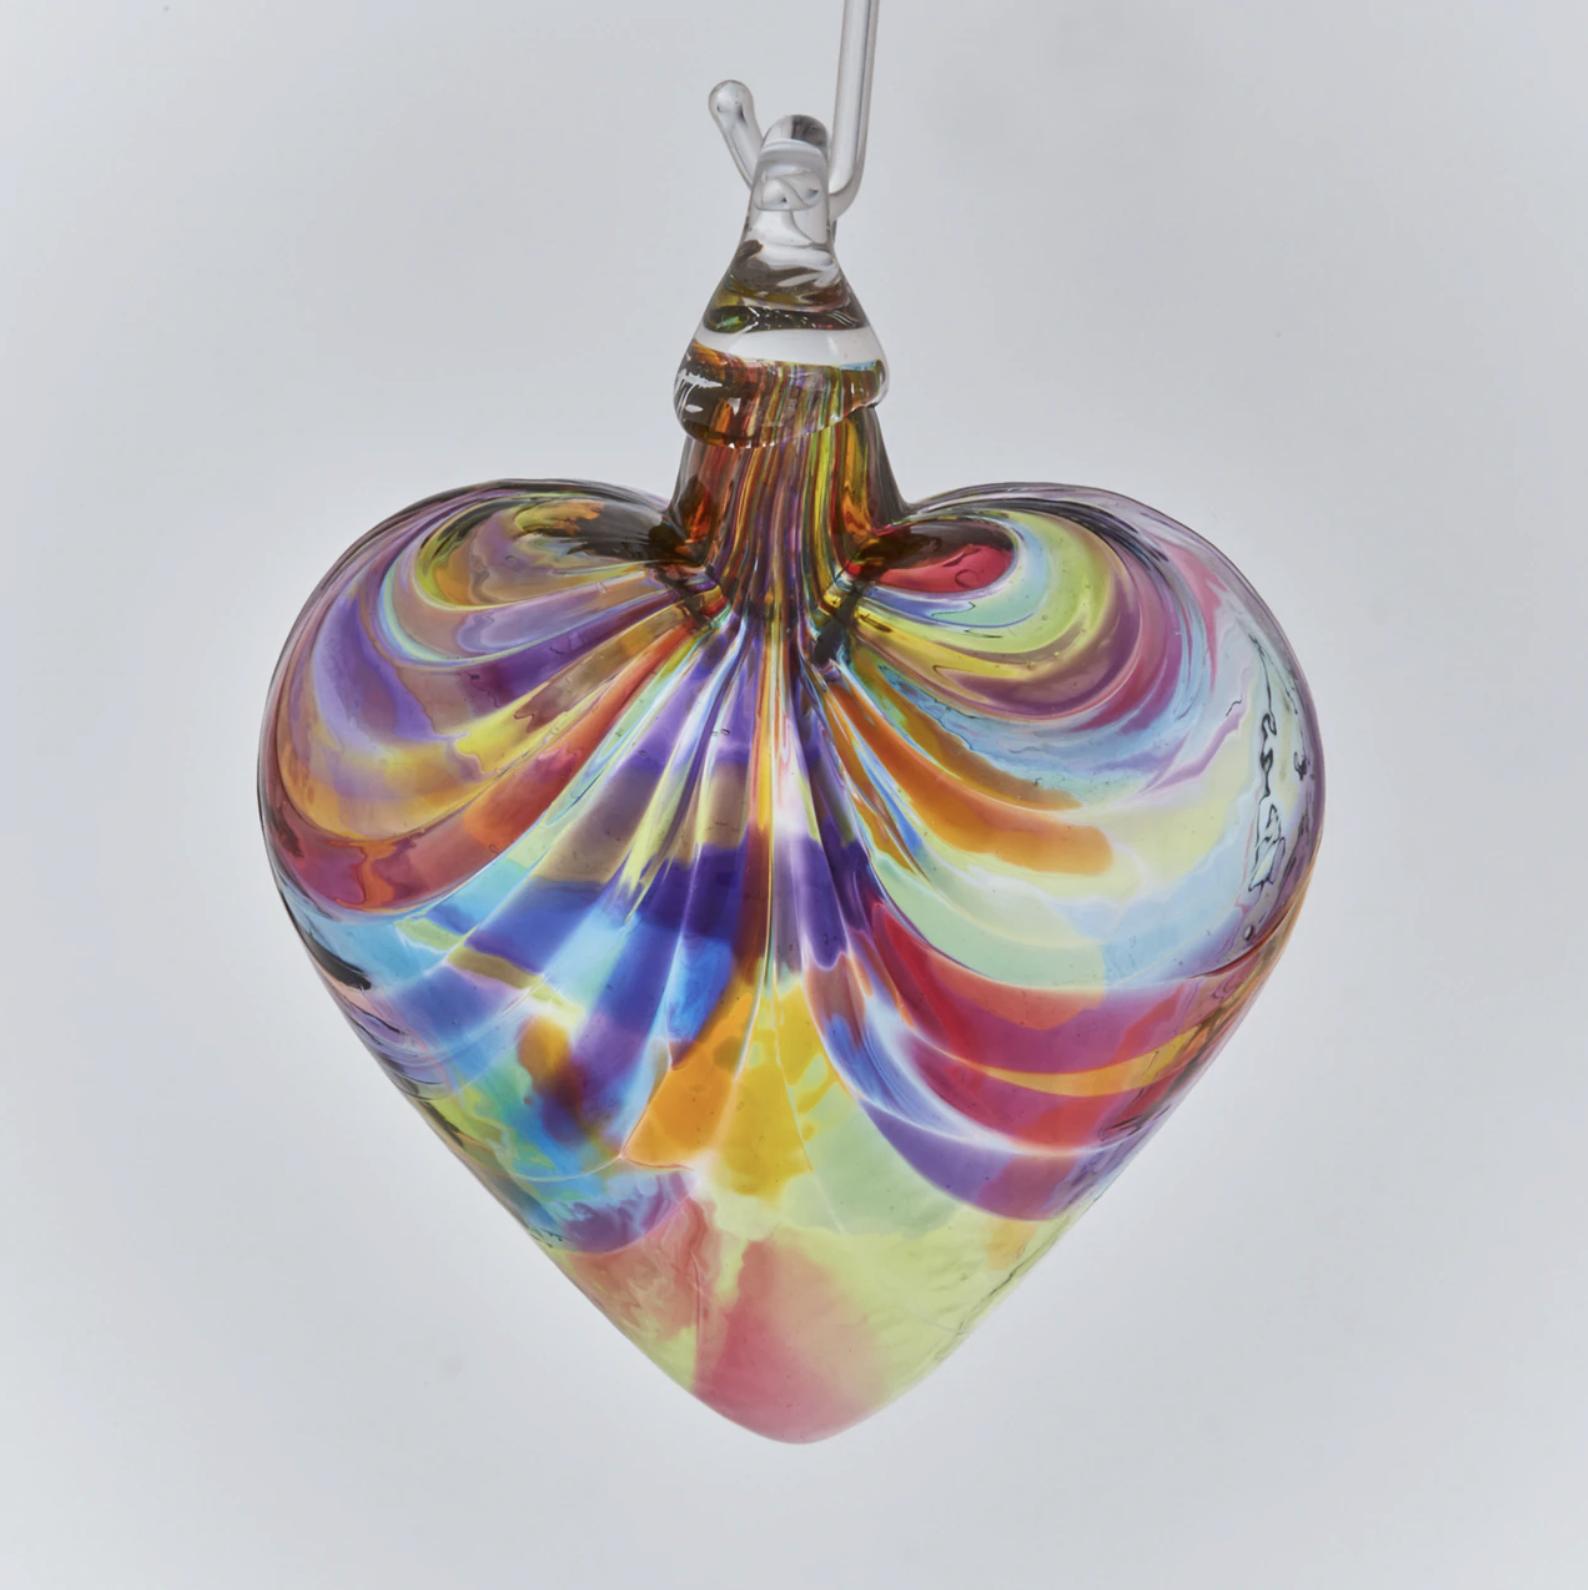 GLASS EYE HEART ORNAMENT